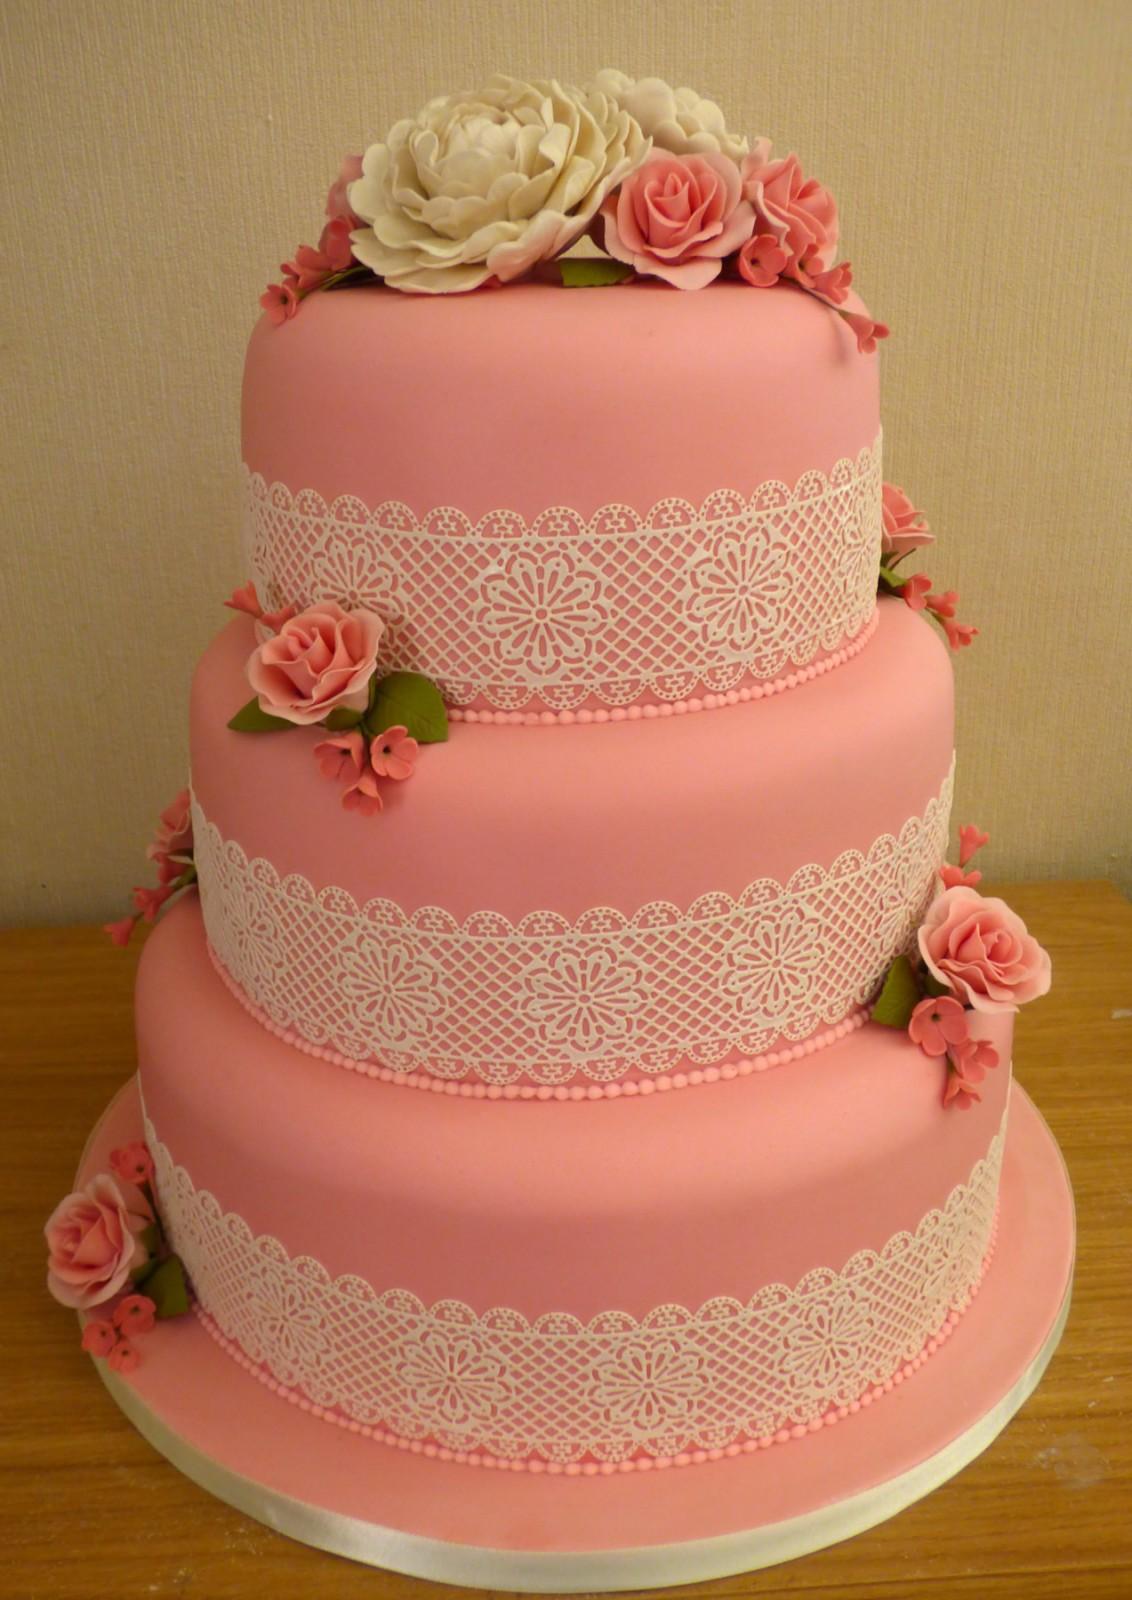 3 Tier Lace Wedding Cake With Peonies 171 Susie S Cakes